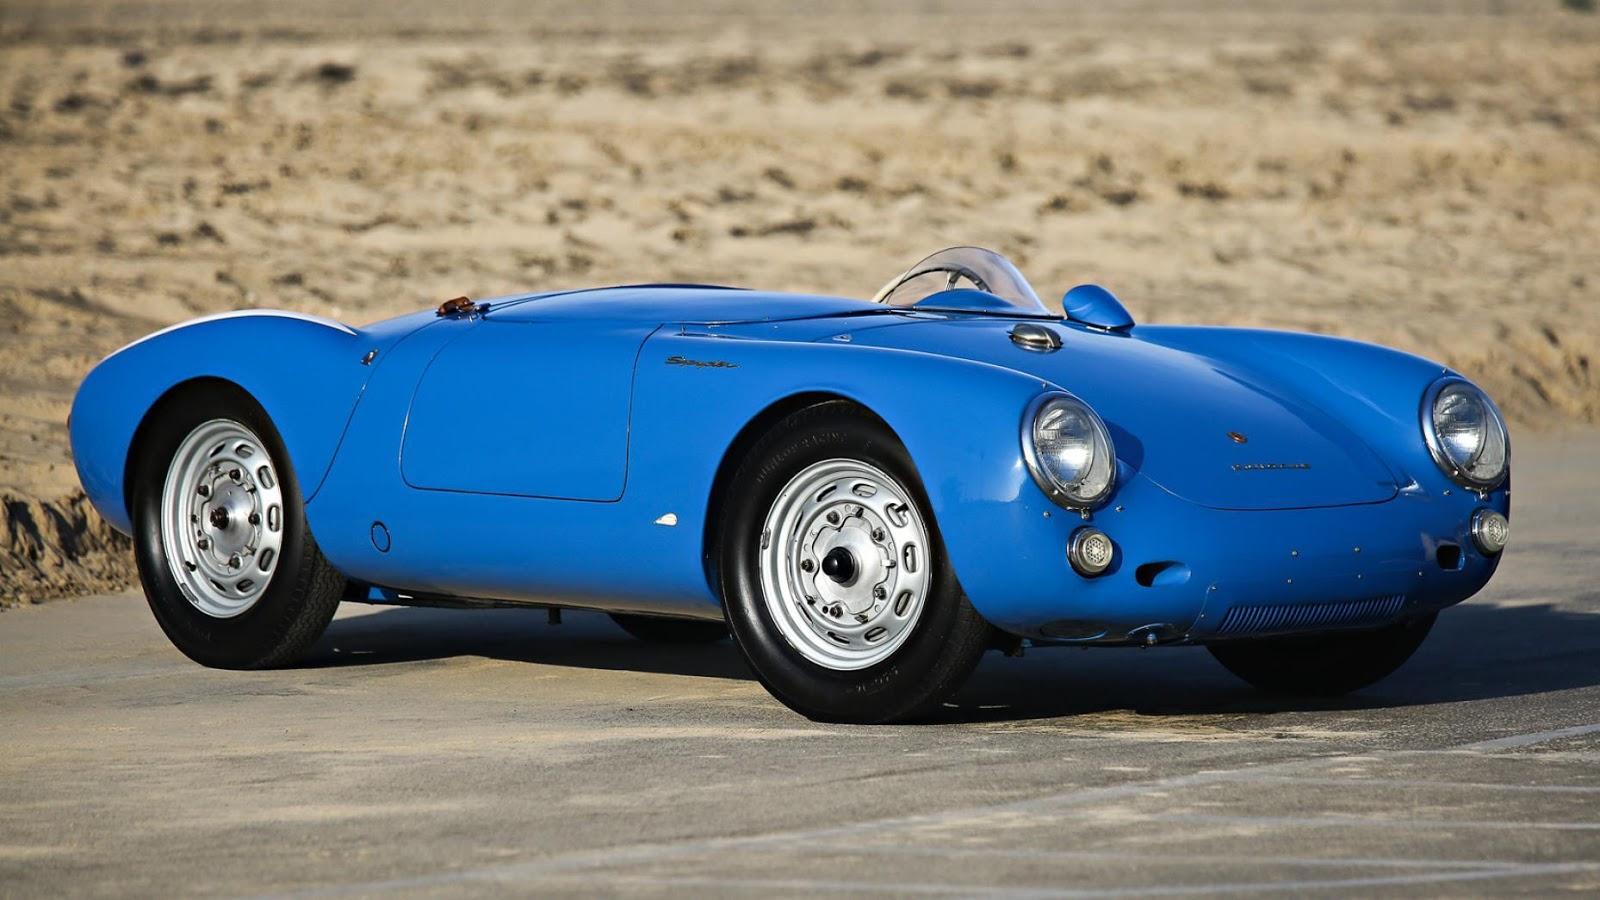 1955 Porsche 550 Roadster: $5,335,000